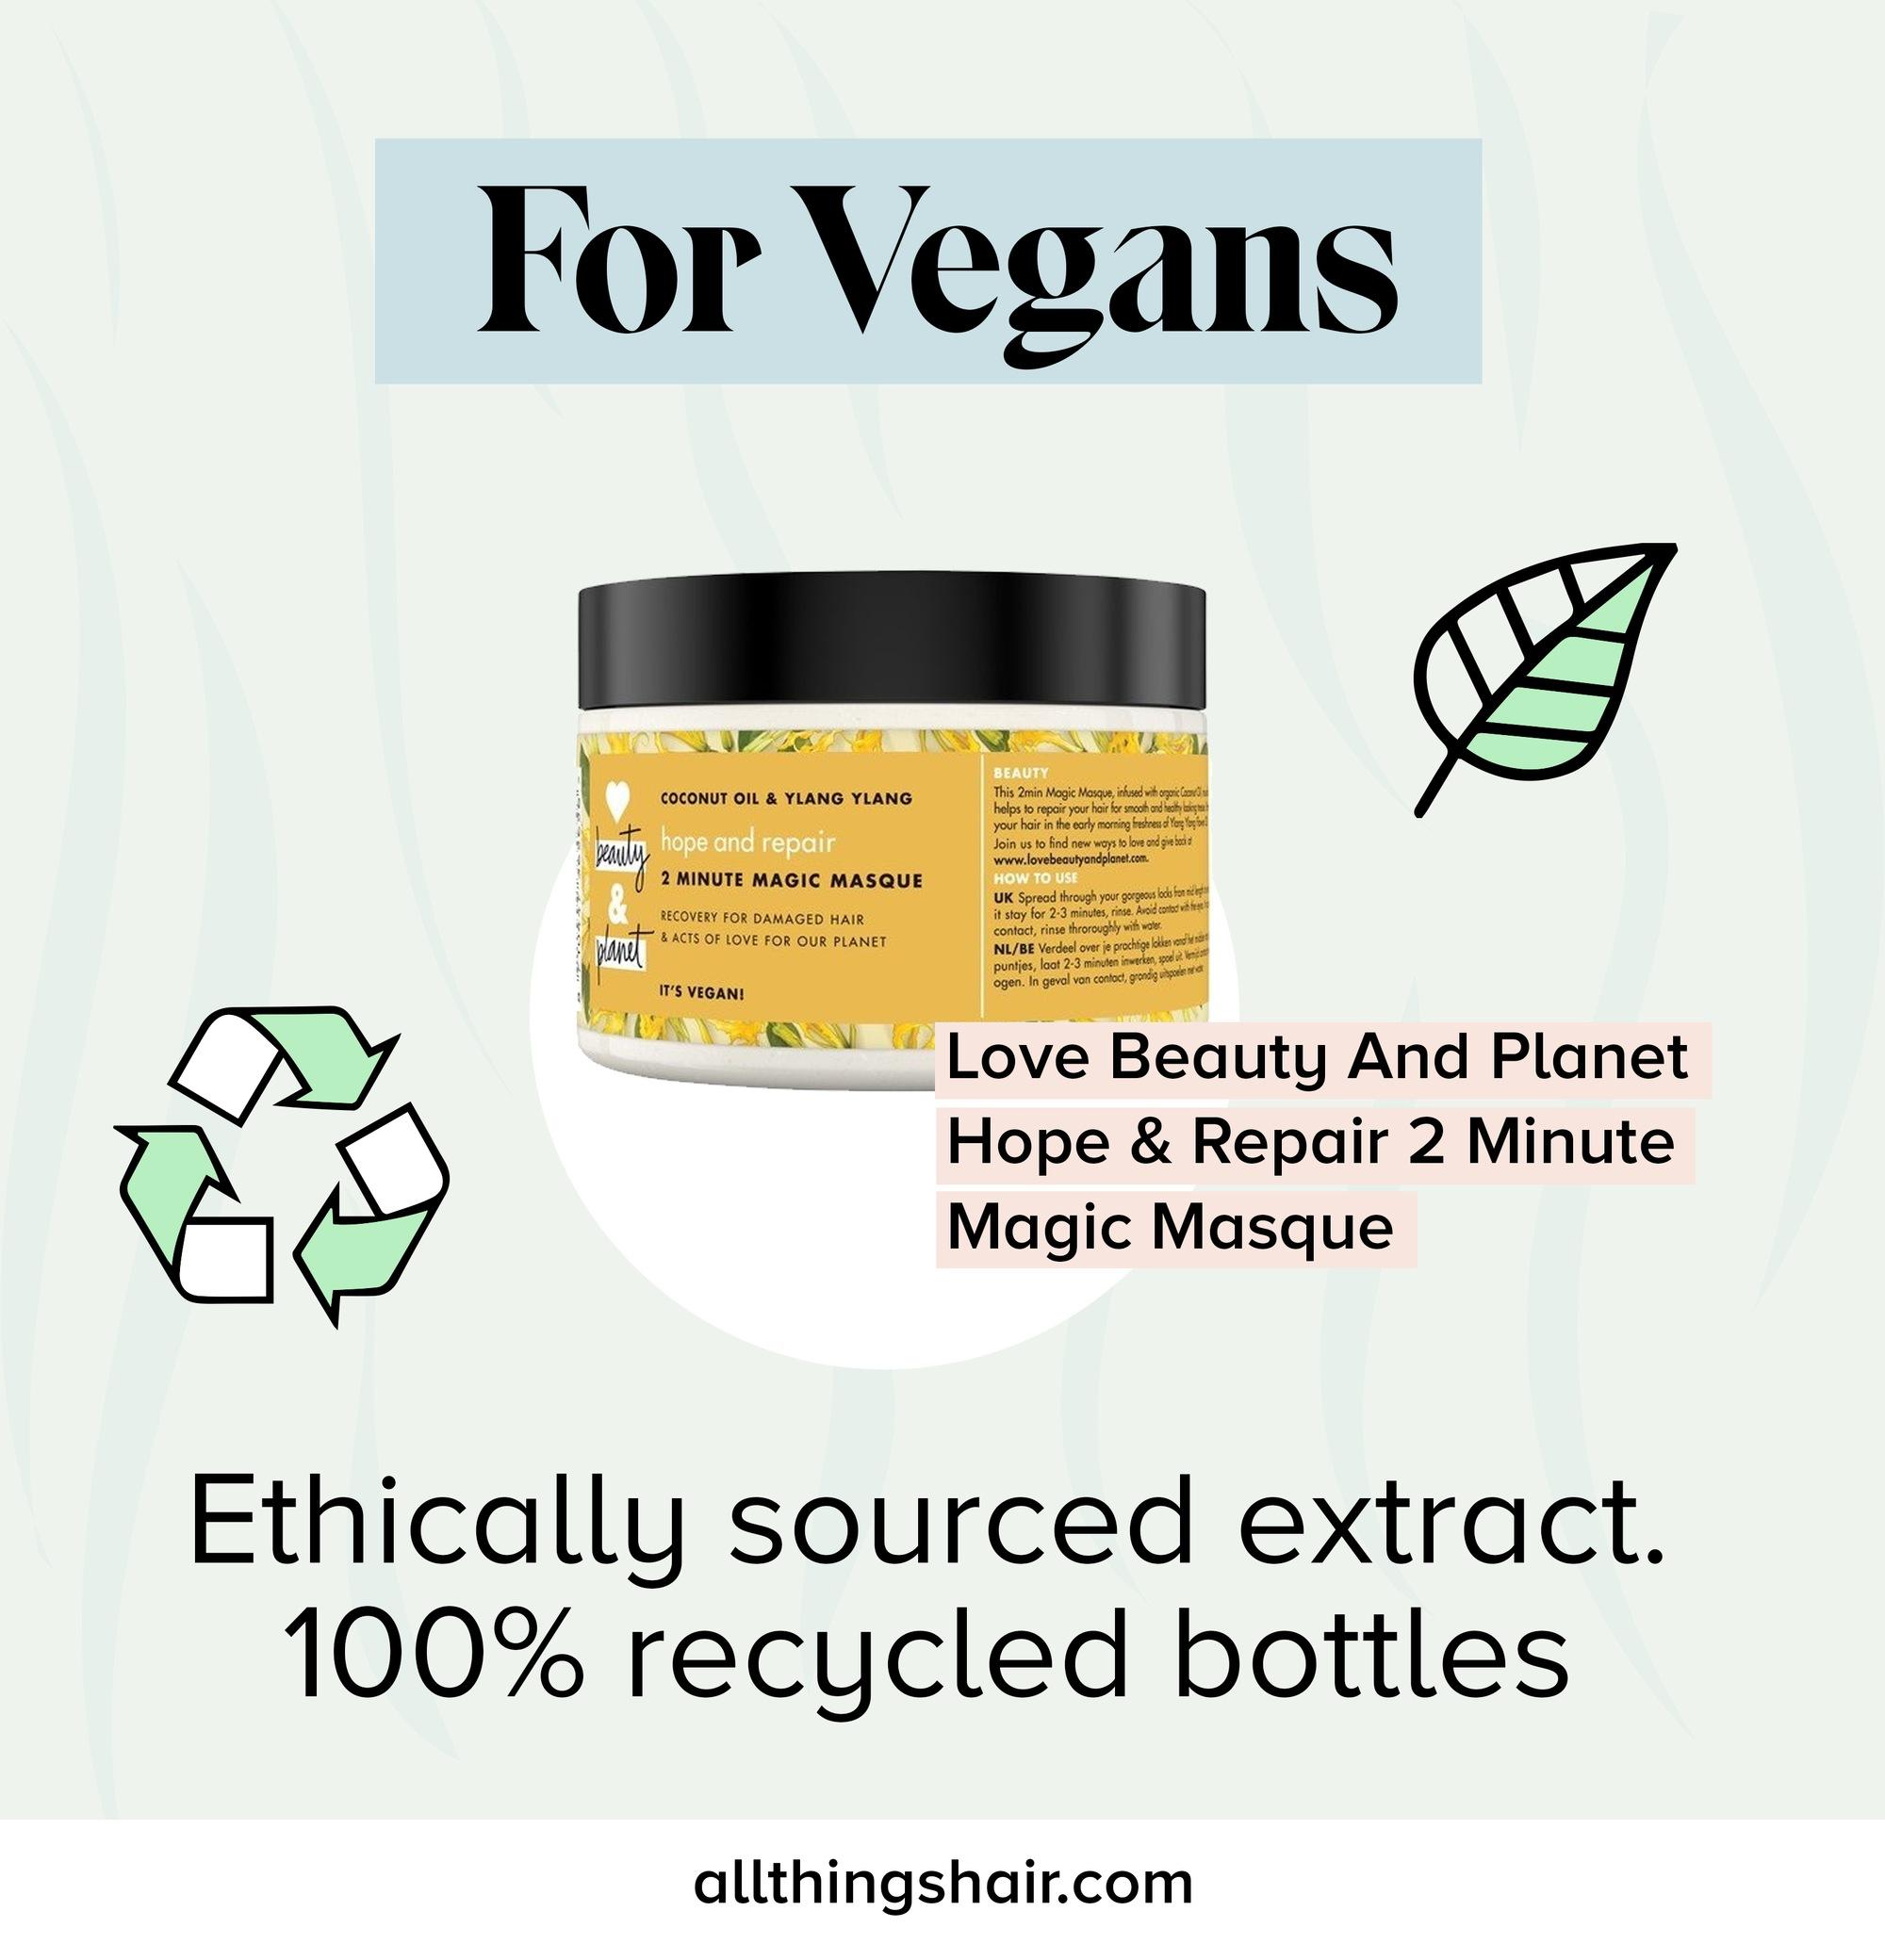 Vegan Love Beauty And Planet masque capillaire infographique